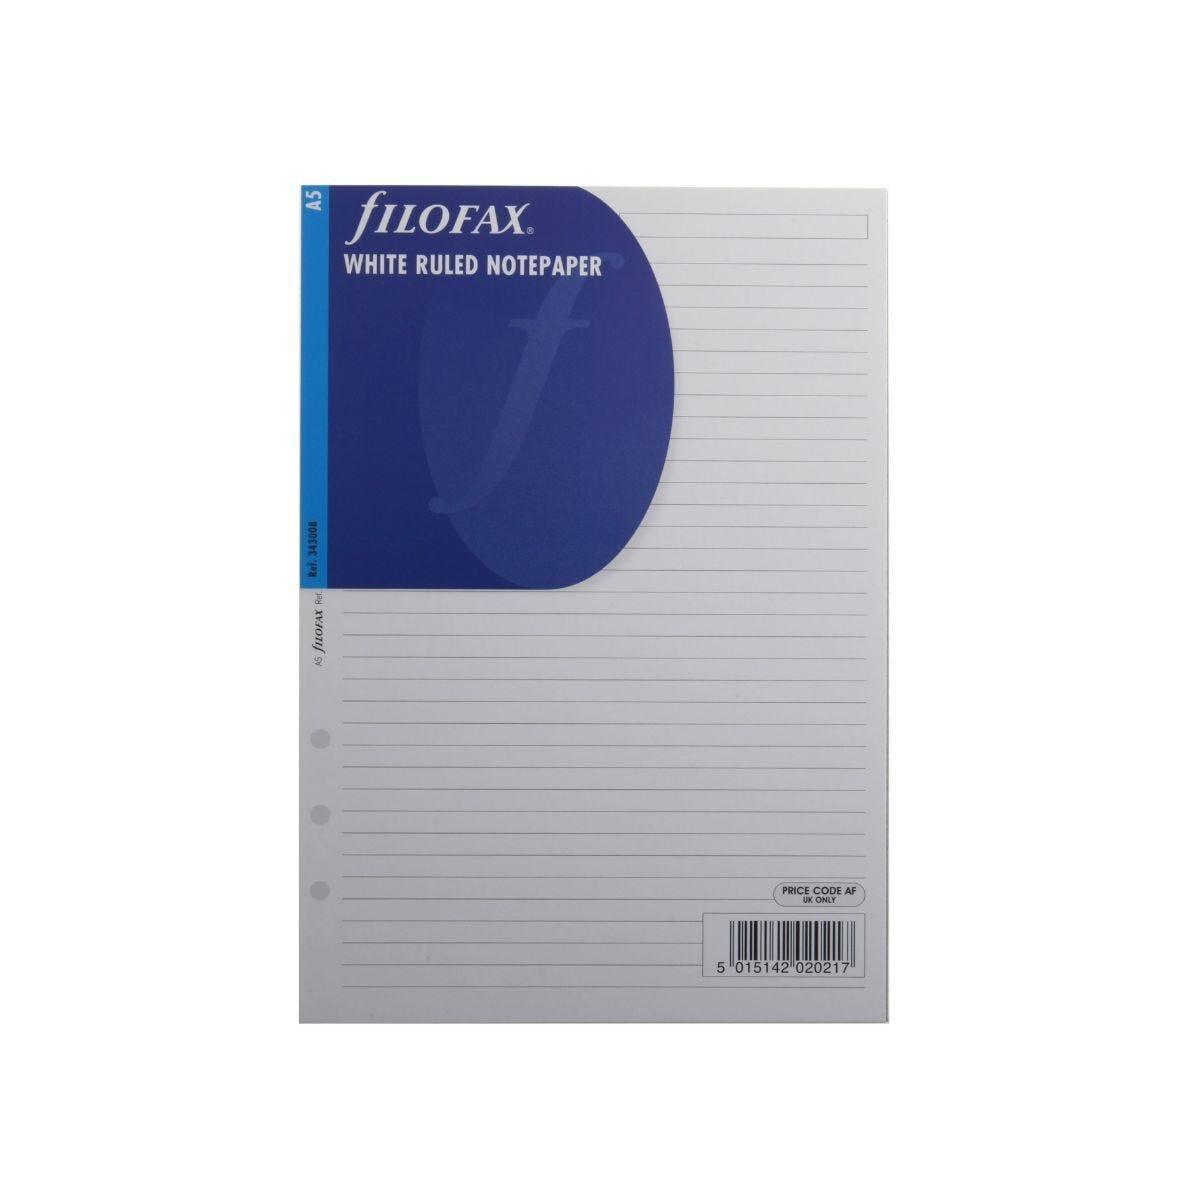 Filofax Refill A5 Ruled 25 Sheets